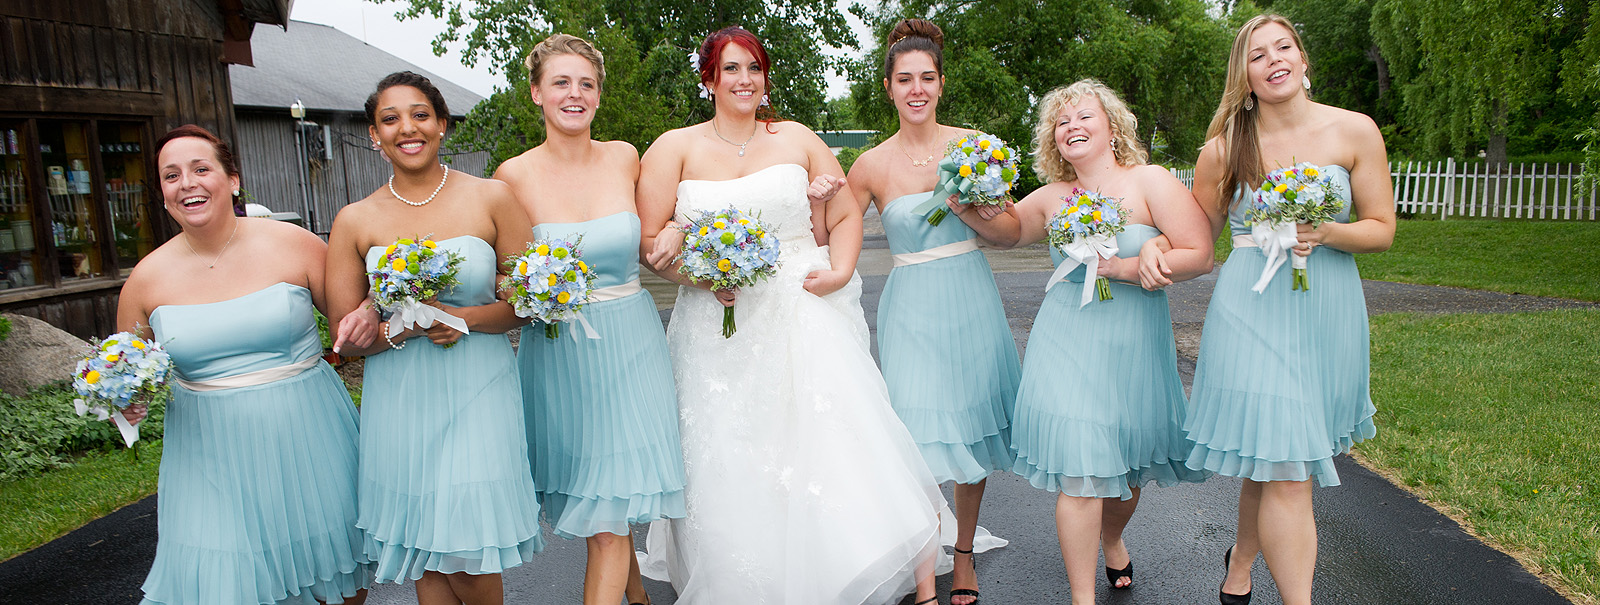 Wedding Photographer in Horseheads, Elmira, Corning, Watkins Glenn ...